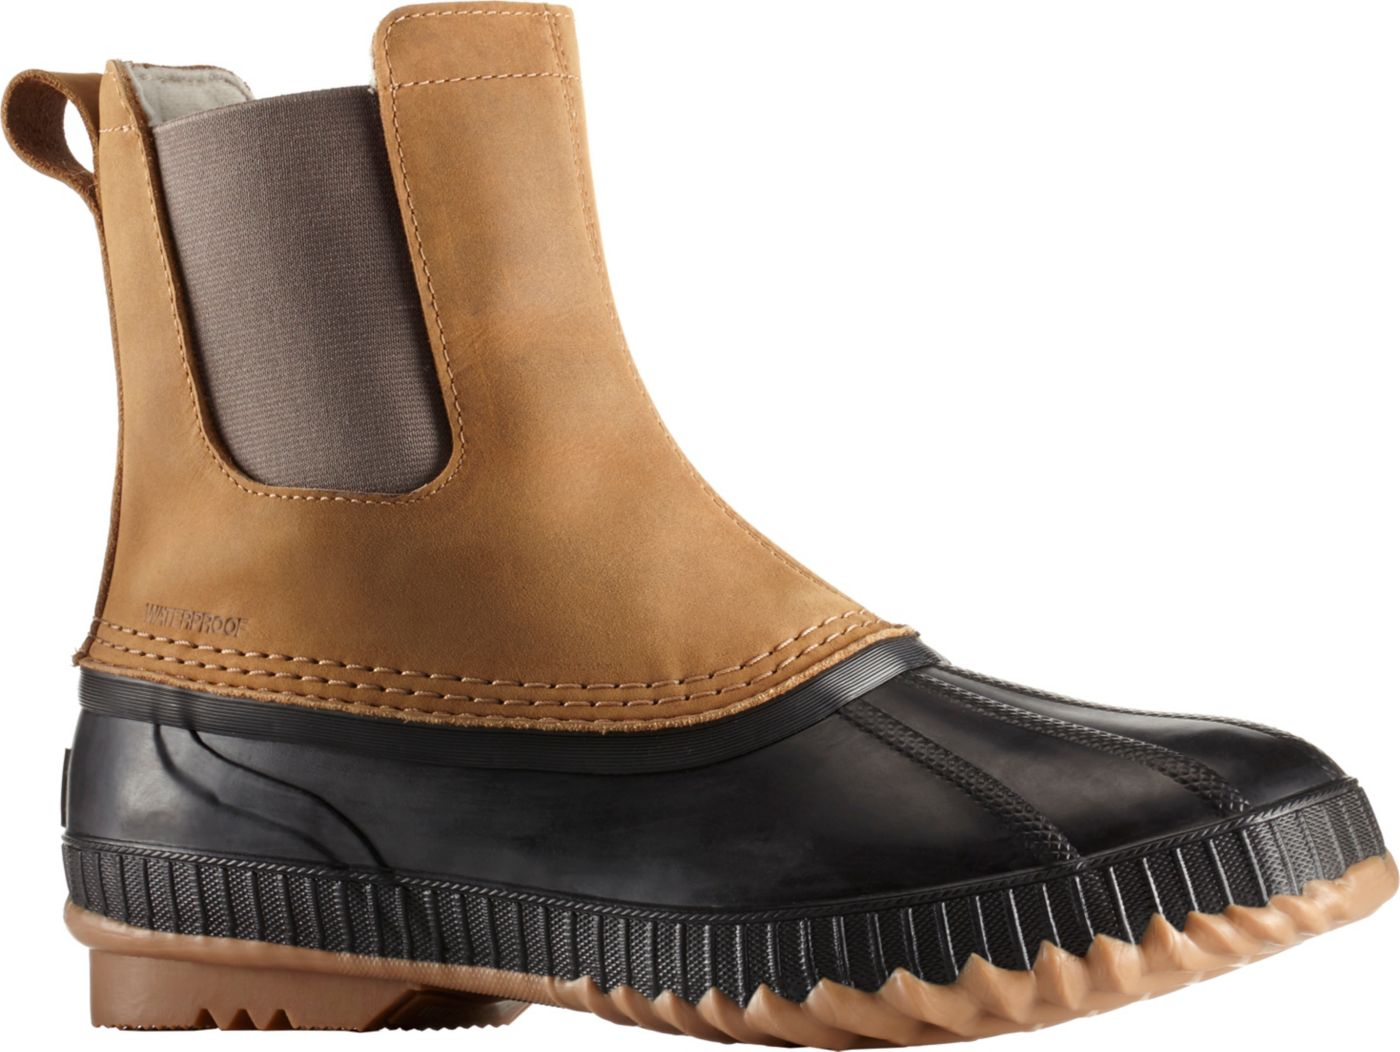 SOREL Men's Cheyanne II Chelsea 200g Waterproof Winter Boots